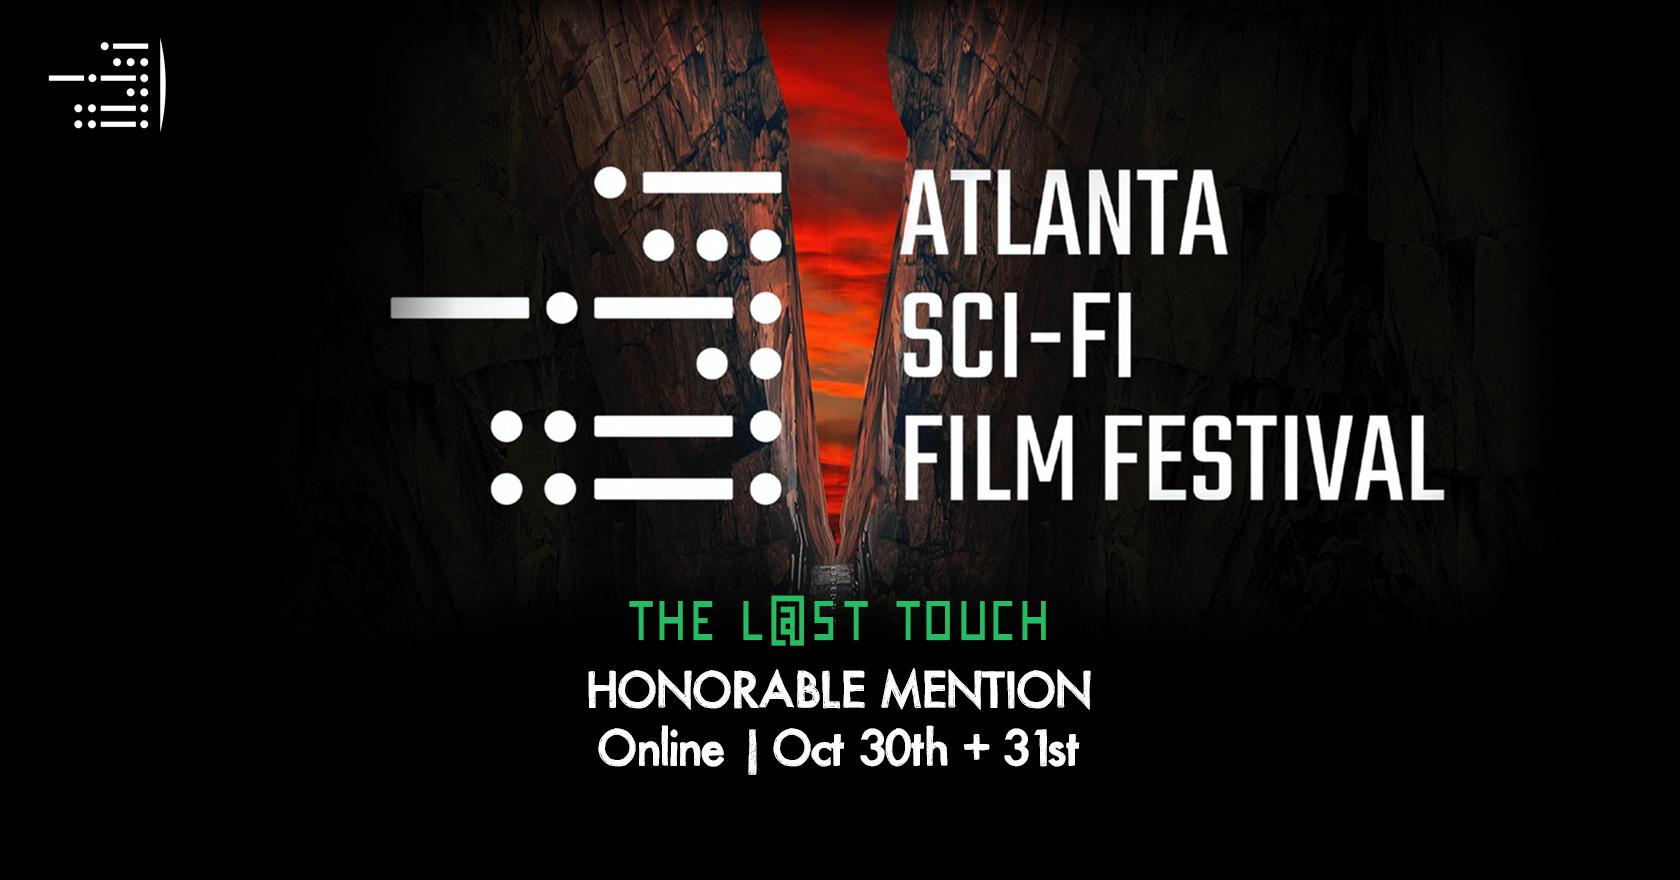 Atlanta Sci-Fi Film Festival 2021 | October 30-31